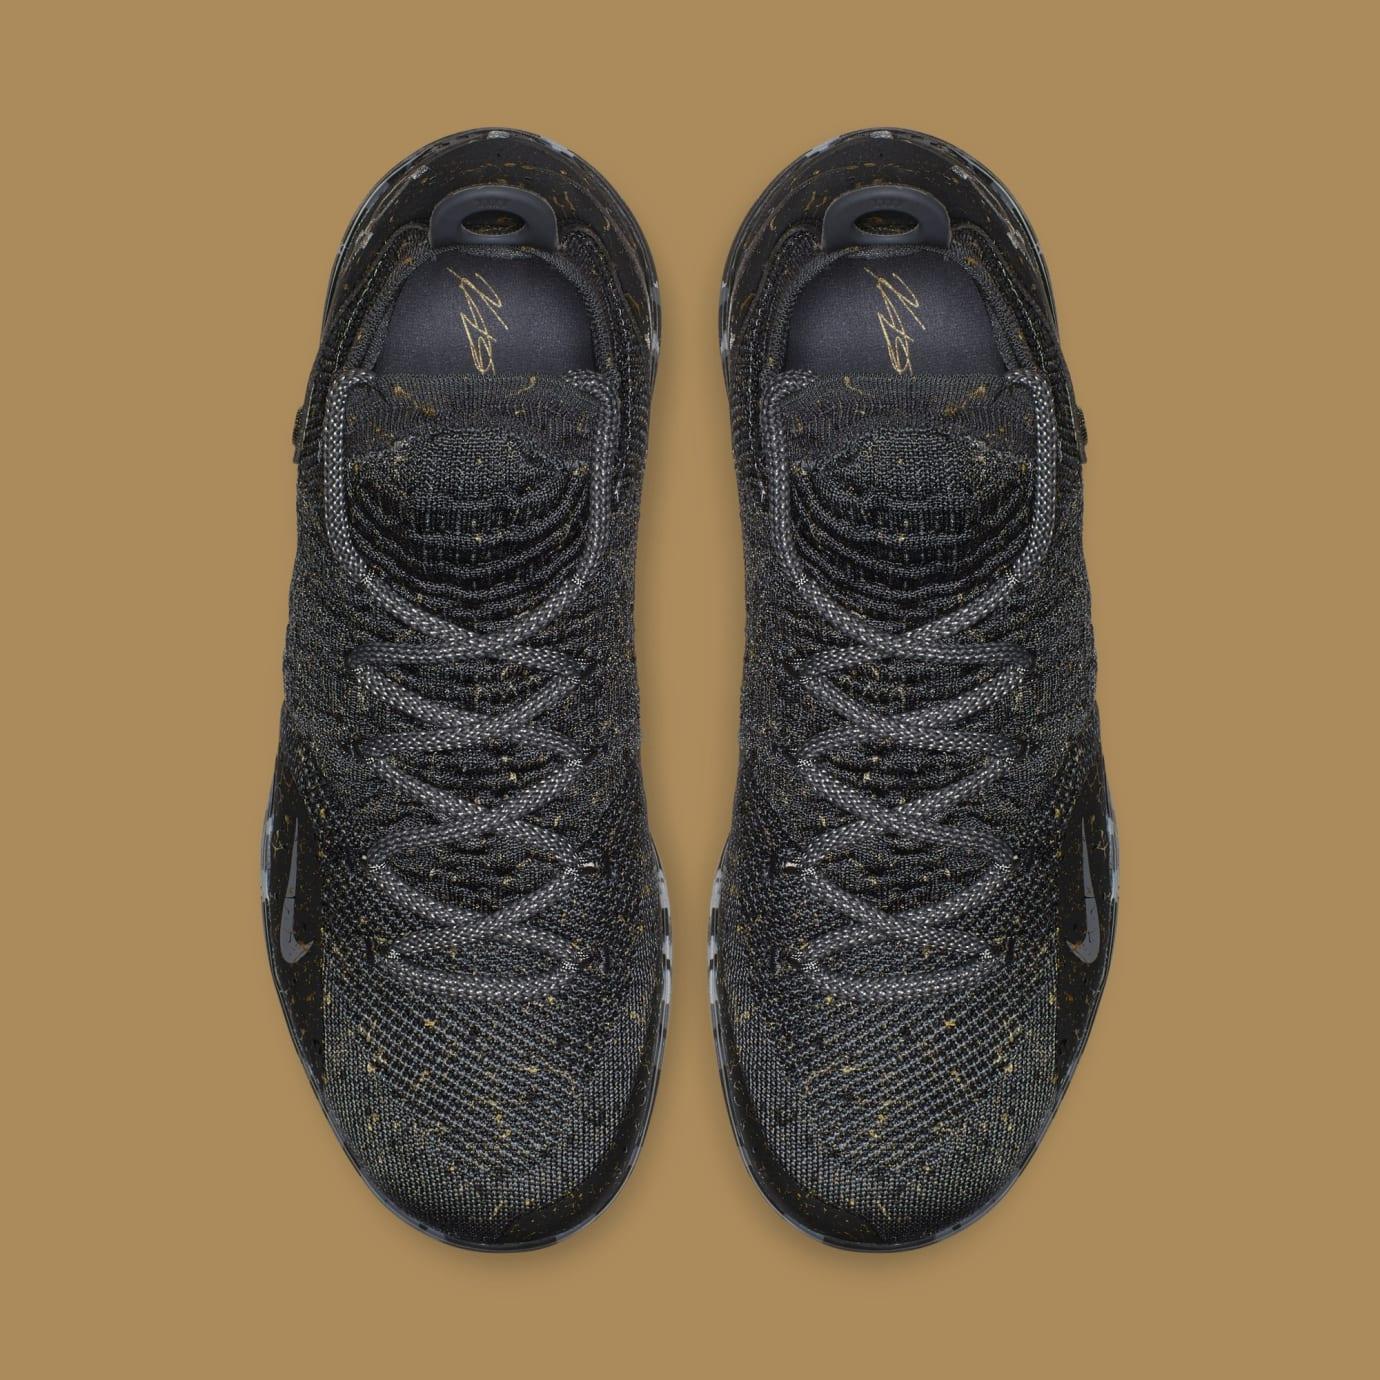 Nike KD 11 'Gold Splatter' AO2604-901 (Top)